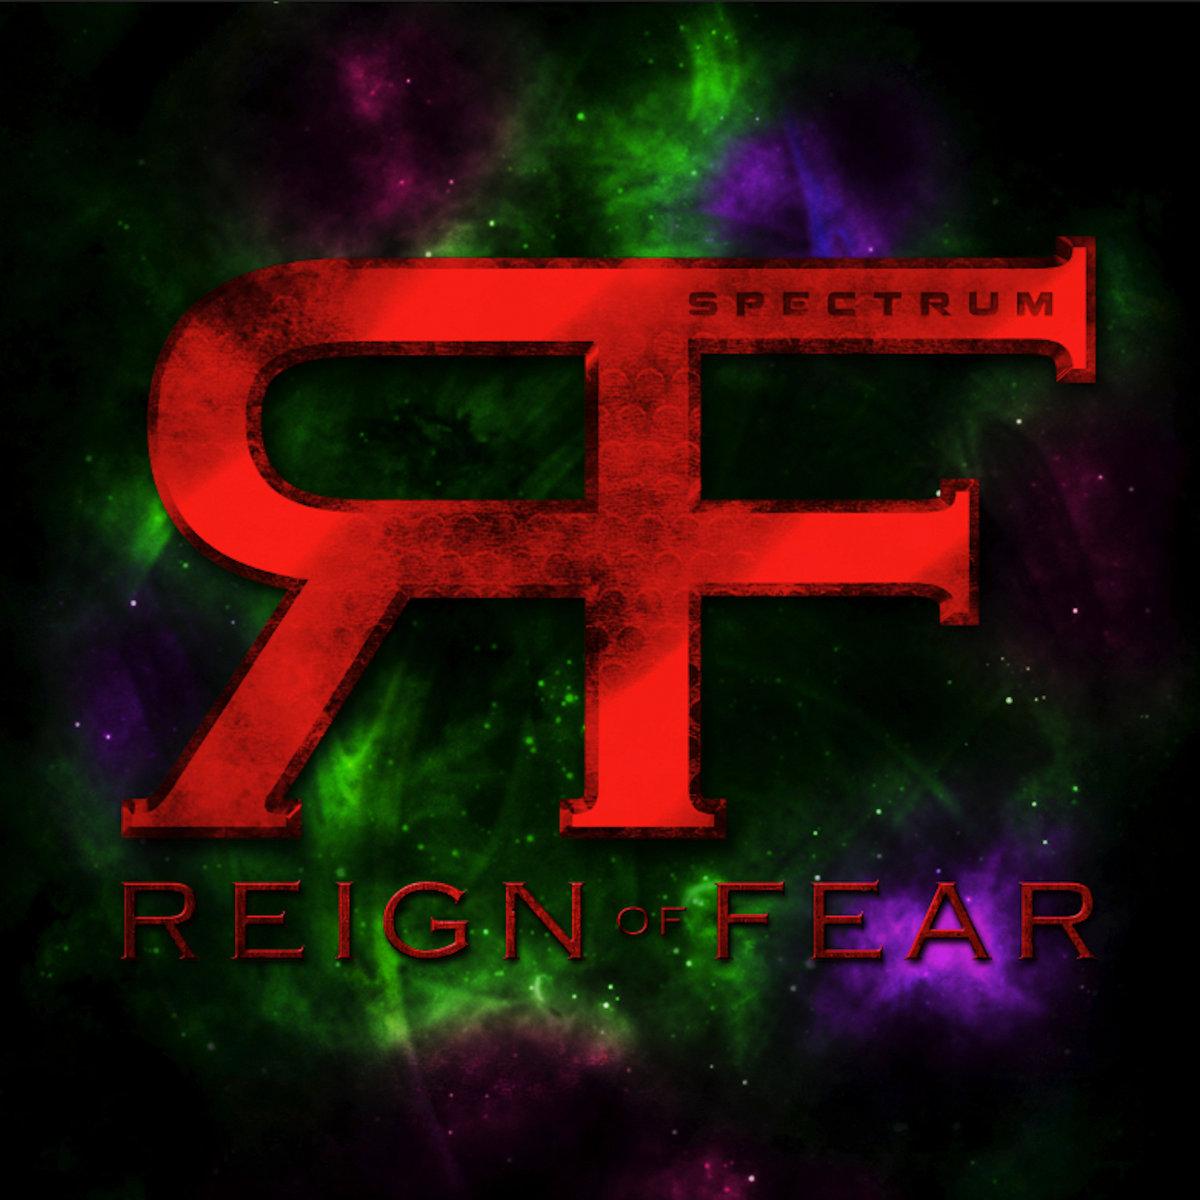 www.facebook.com/reignoffear